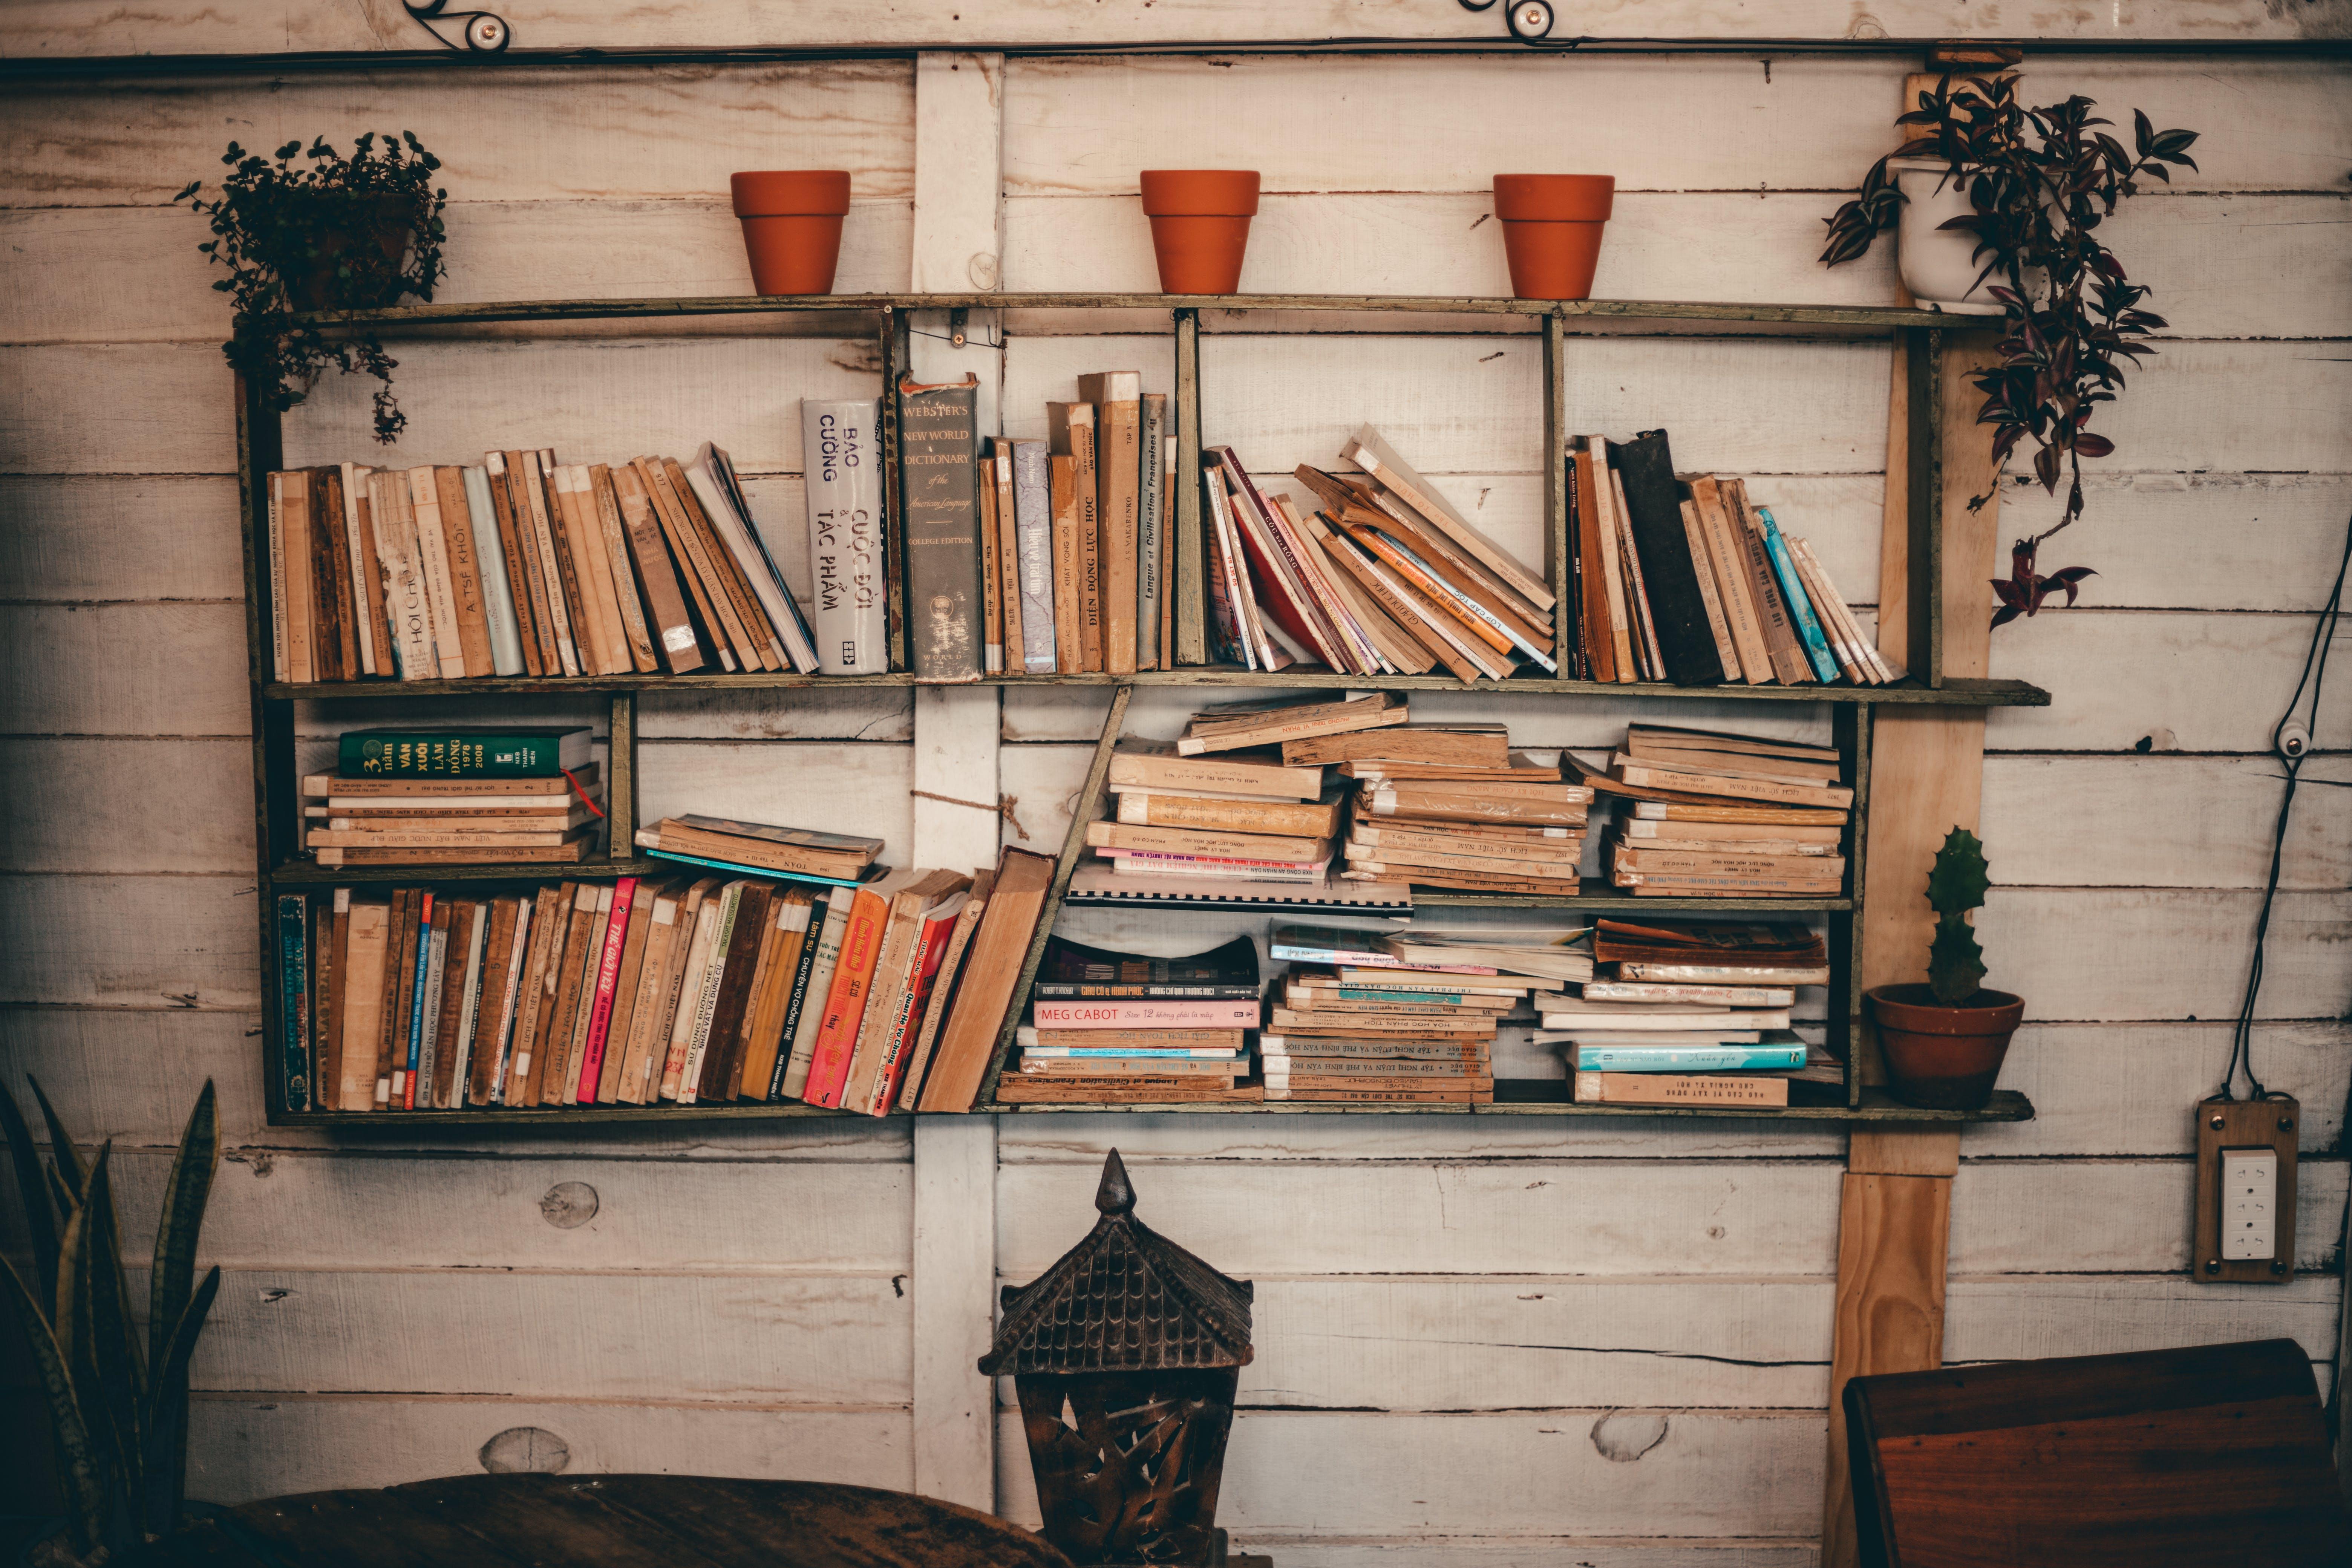 Gratis arkivbilde med bibliotek, bokhylle, bokhyller, bøker